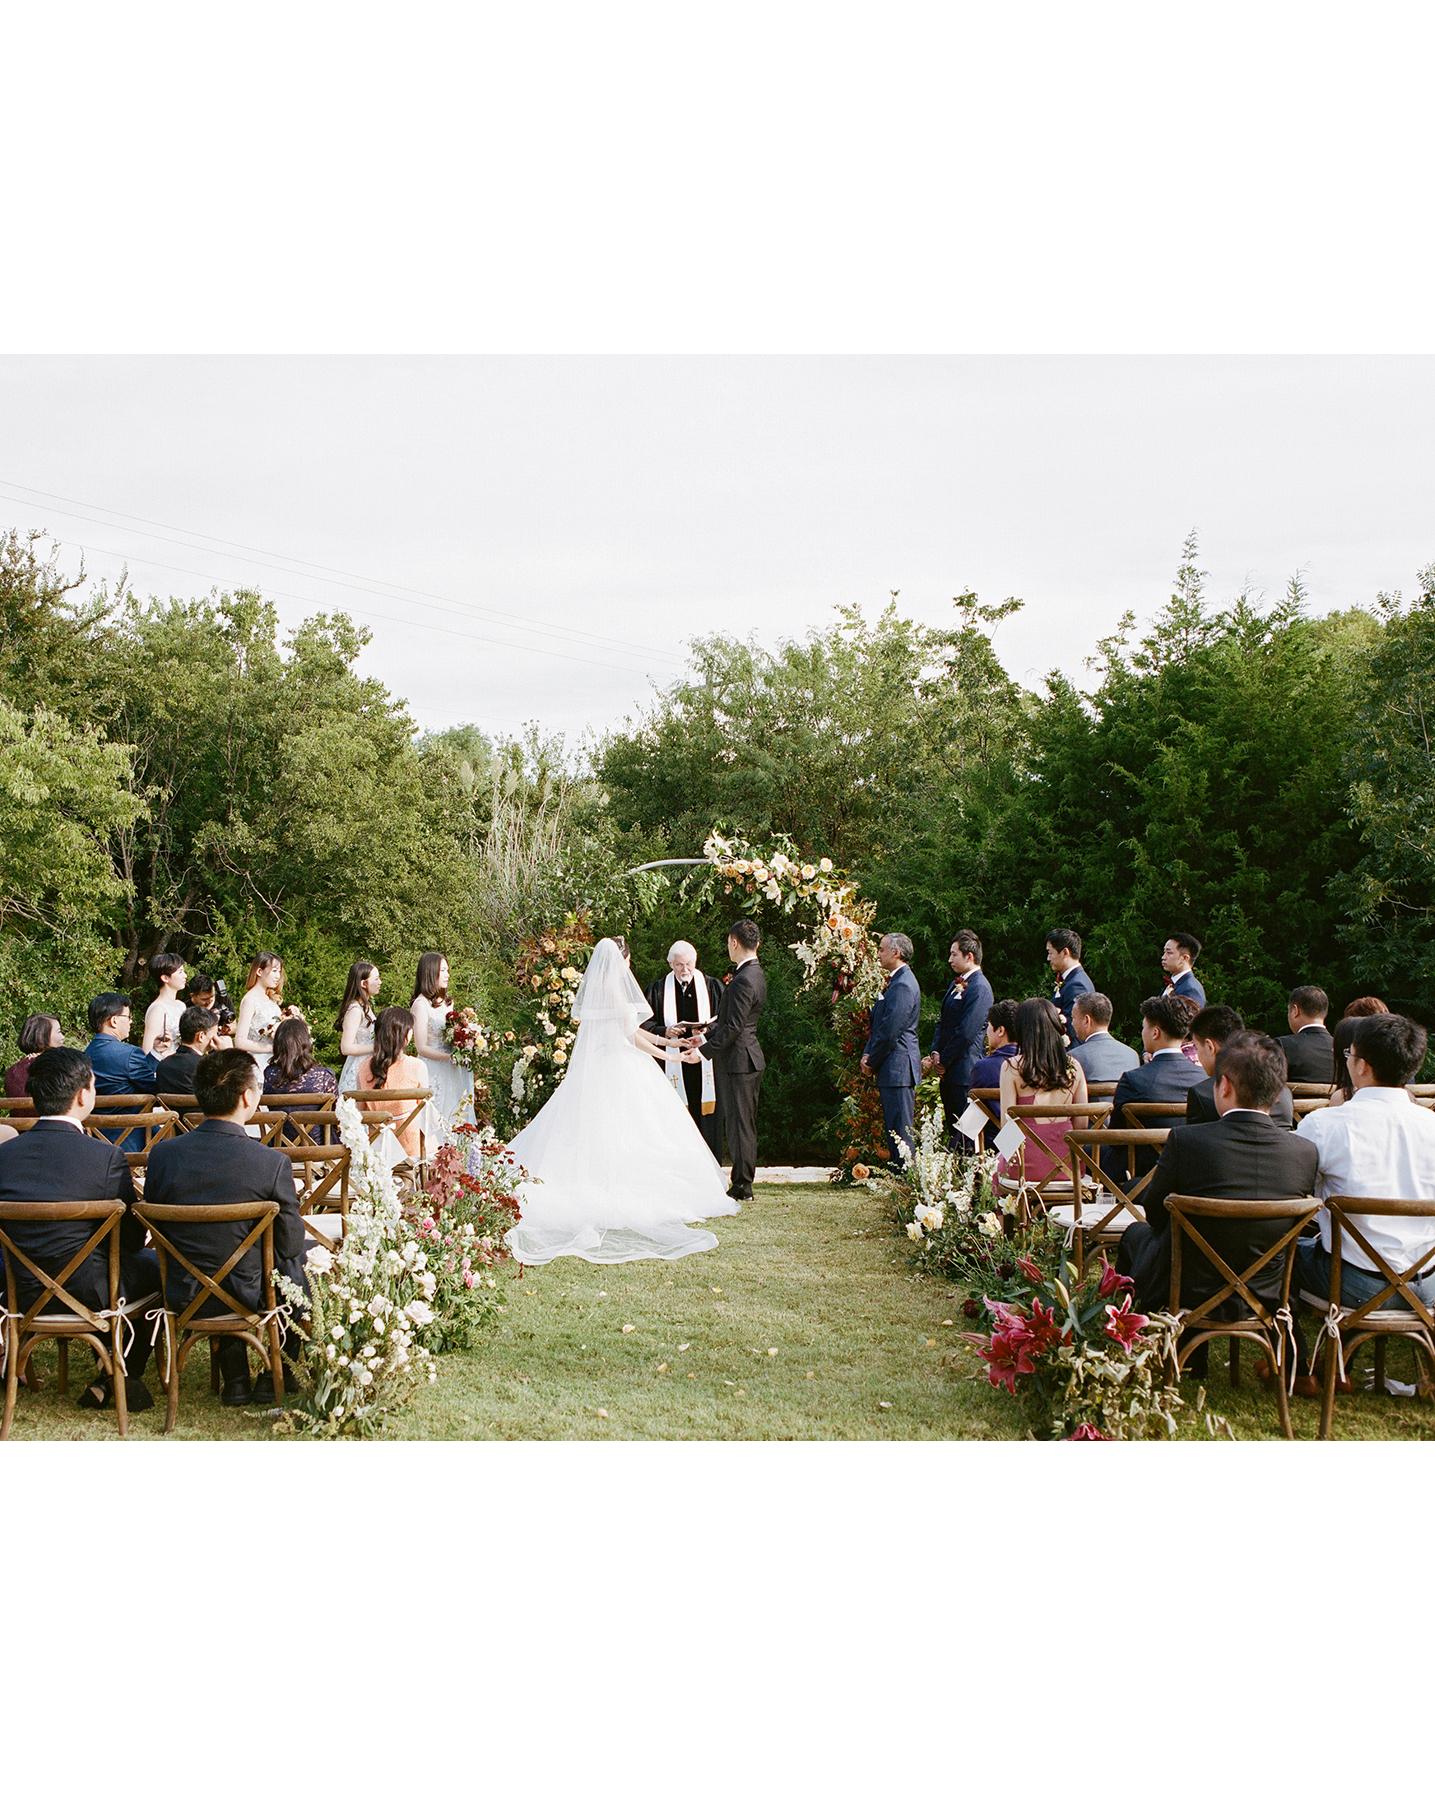 ivana nevin wedding outdoor ceremony